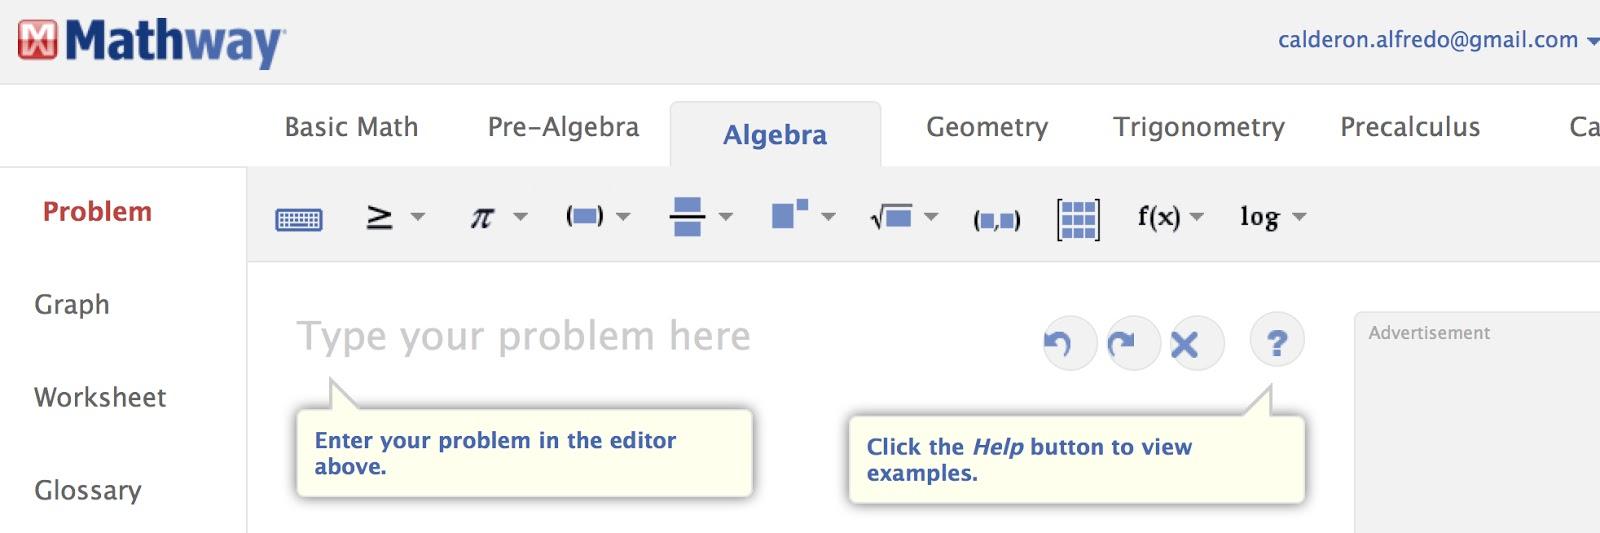 Aprendizaje a Distancia: Recursos para maestros de matemáticas